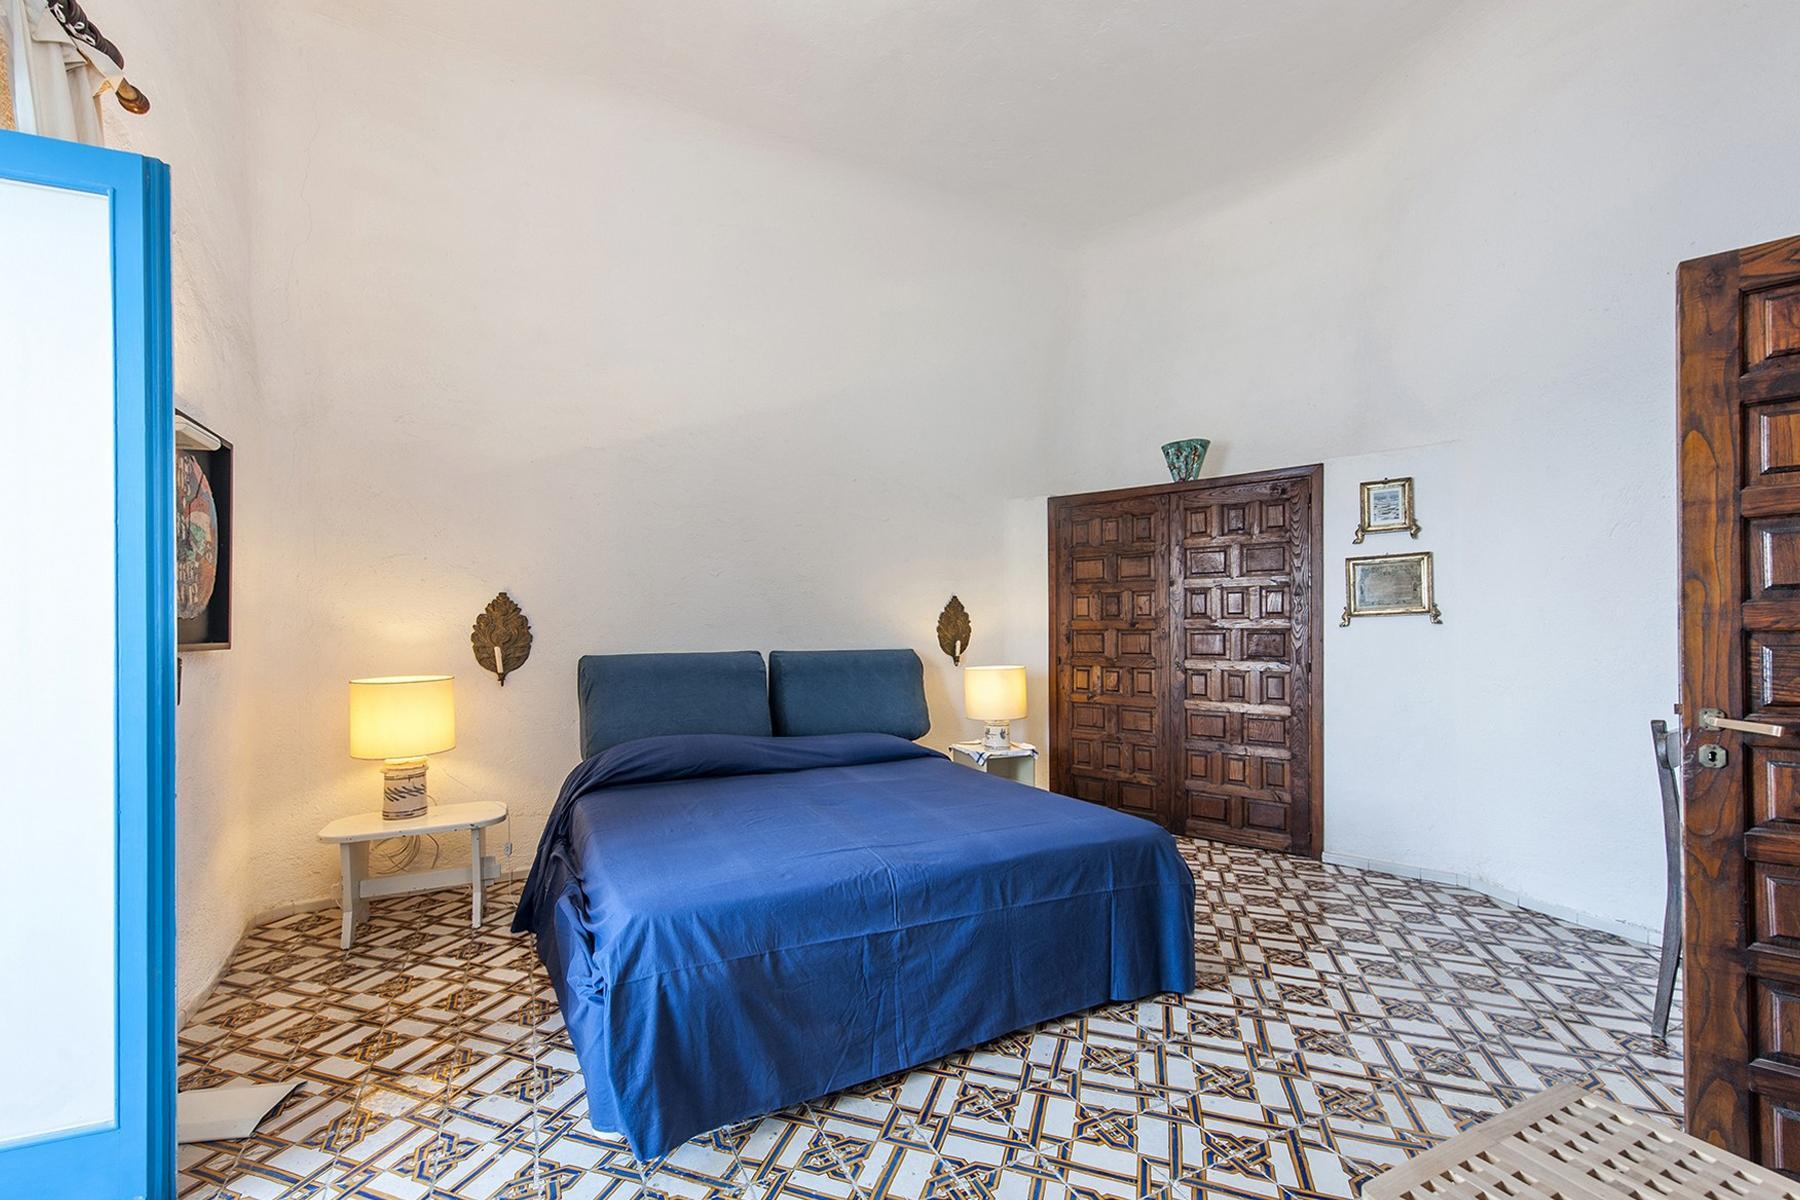 Conca Dei Marini的Via Marina街道 价格面议    面积400平方米 - 20